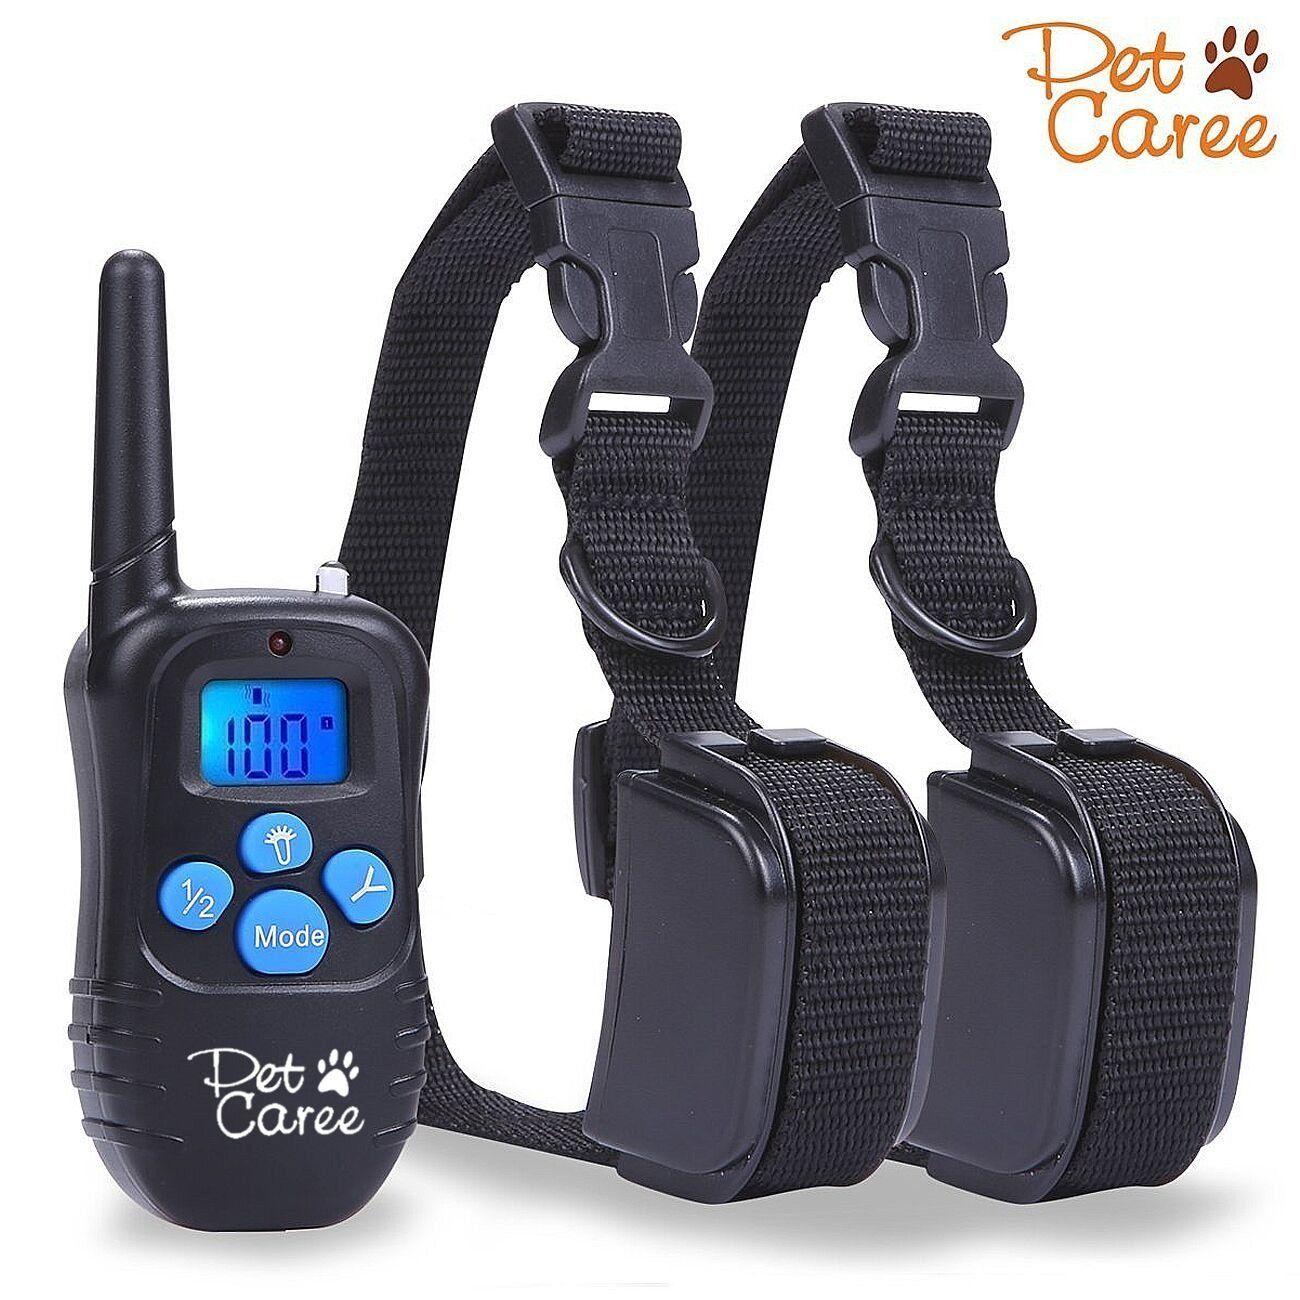 Dog Training Collar Upgraded Sokos Led Backlight Rechargable 330yd